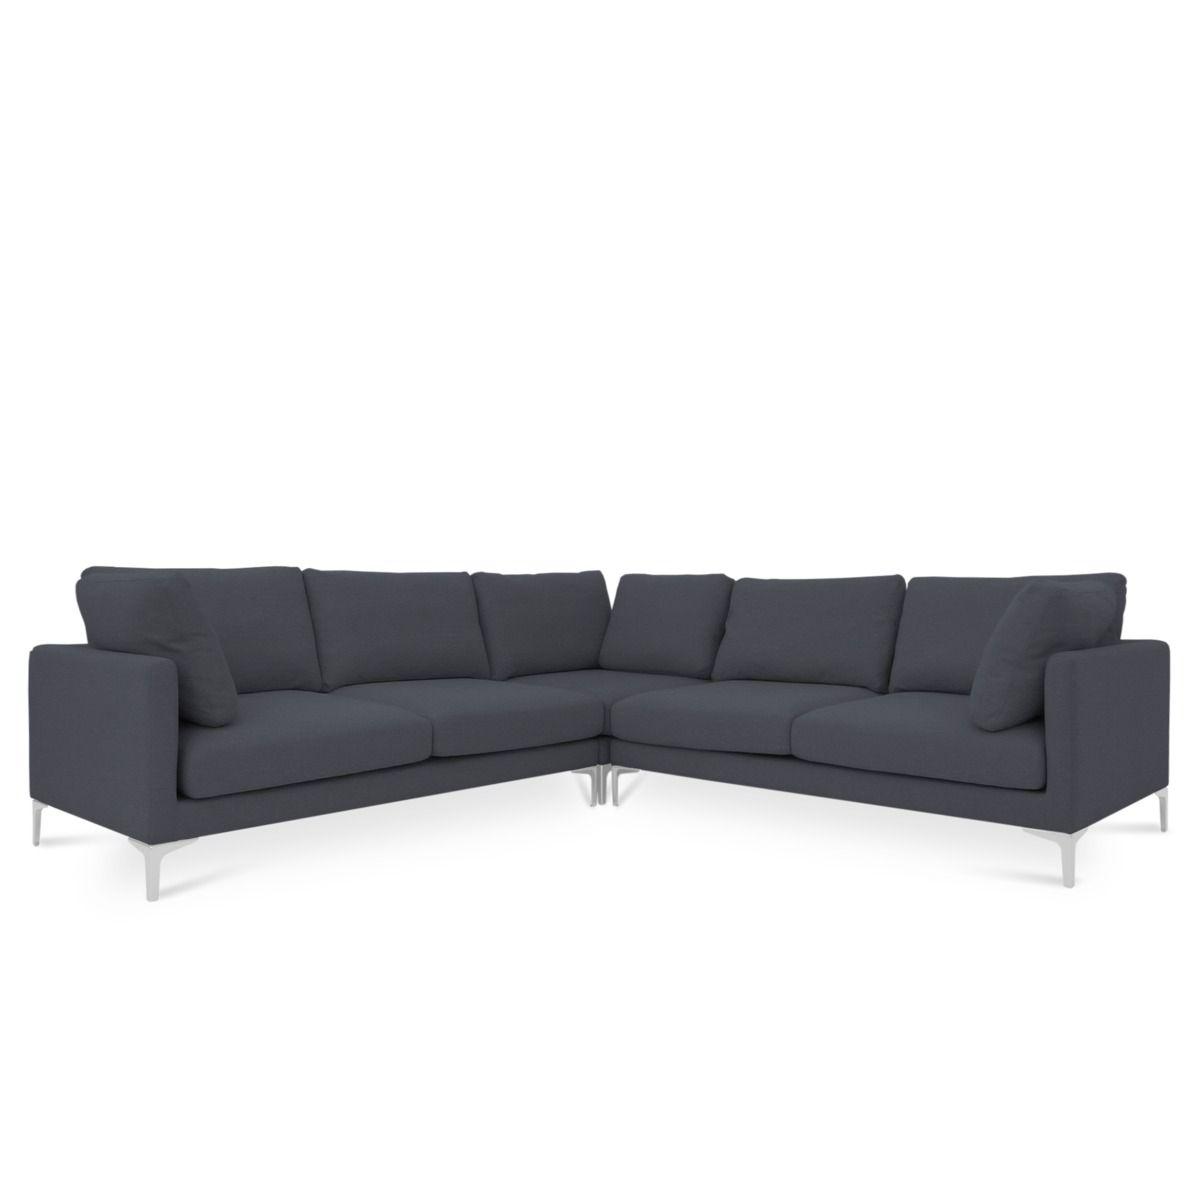 Adams L Shape Sectional Sofa Sectional Sofa L Shaped Sofa Classic Living Room